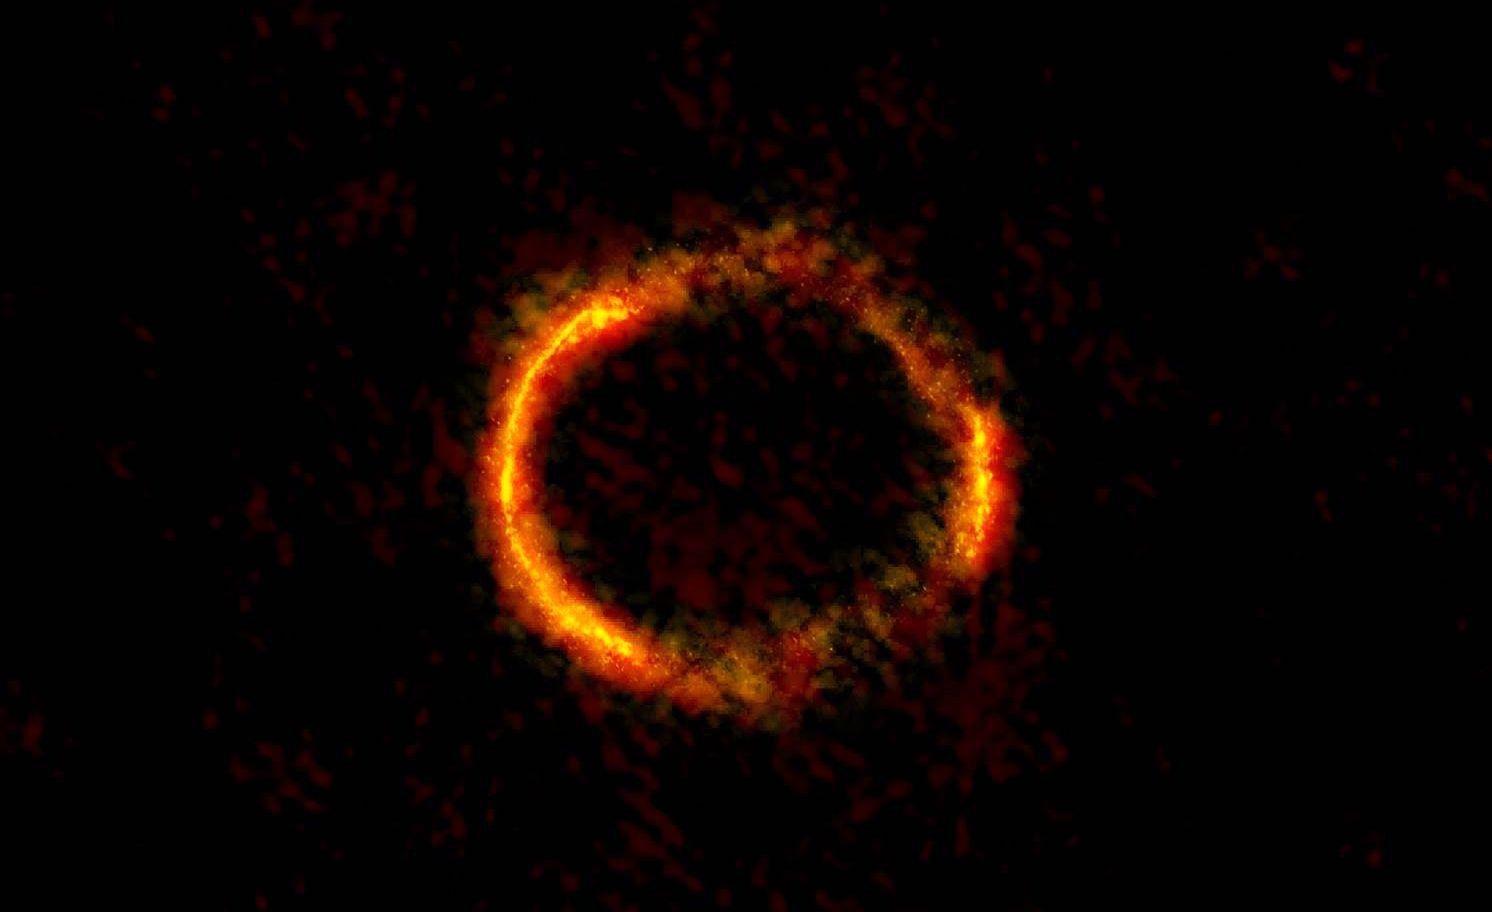 Das leuchtende Gas der Galaxie SDP.81, oder was die Gravitationslinse daraus macht. Bild: ALMA (NRAO/ESO/NAOJ); B. Saxton NRAO/AUI/NSF